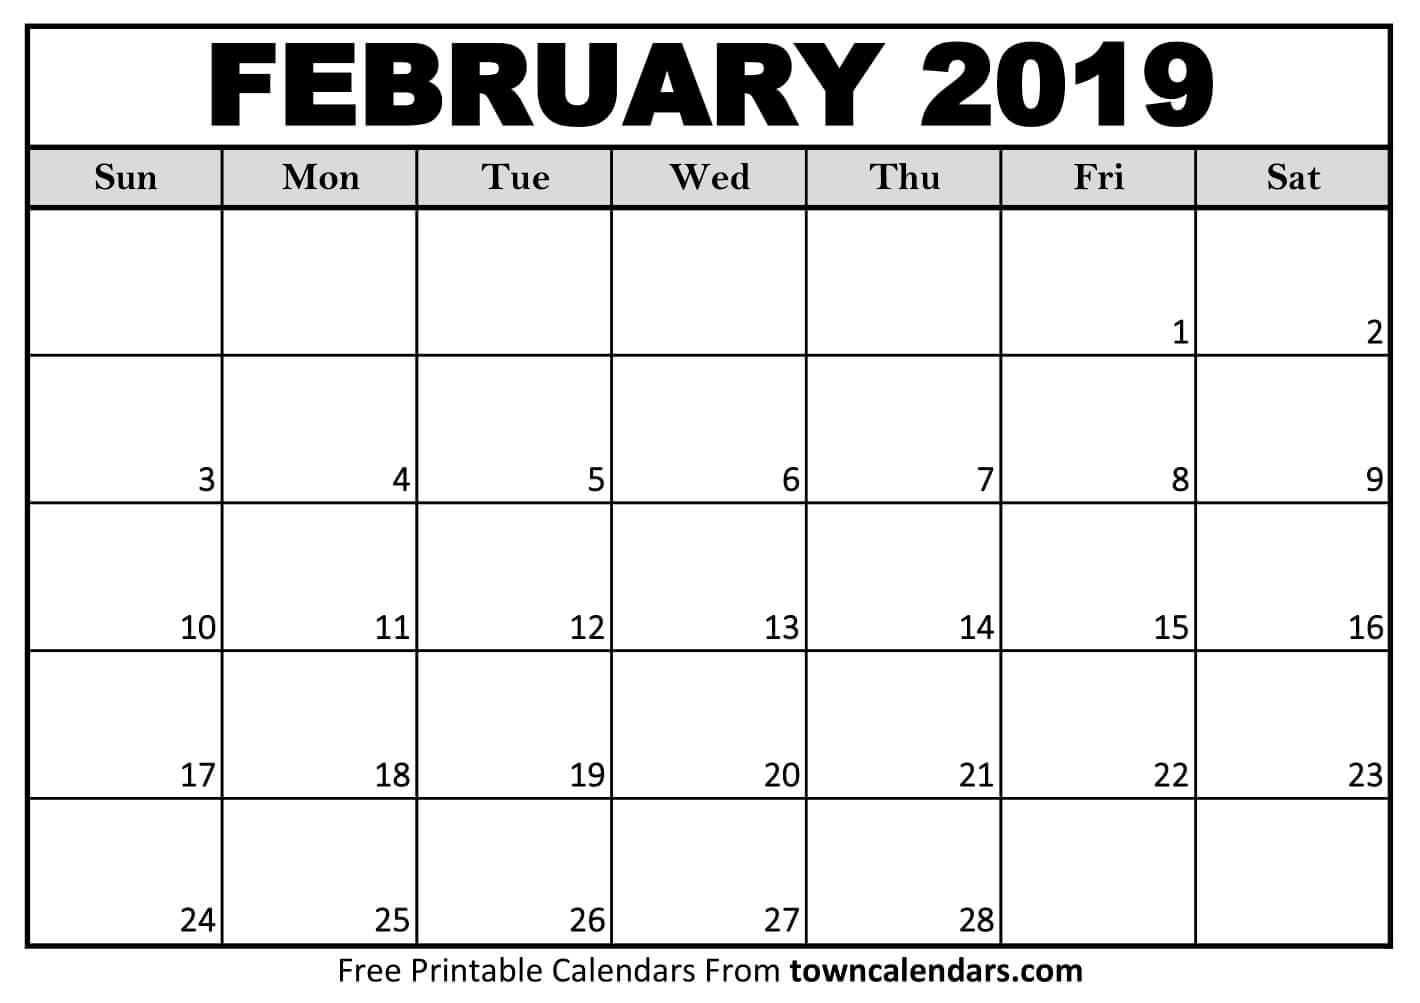 Printable February 2019 Calendar towncalendars